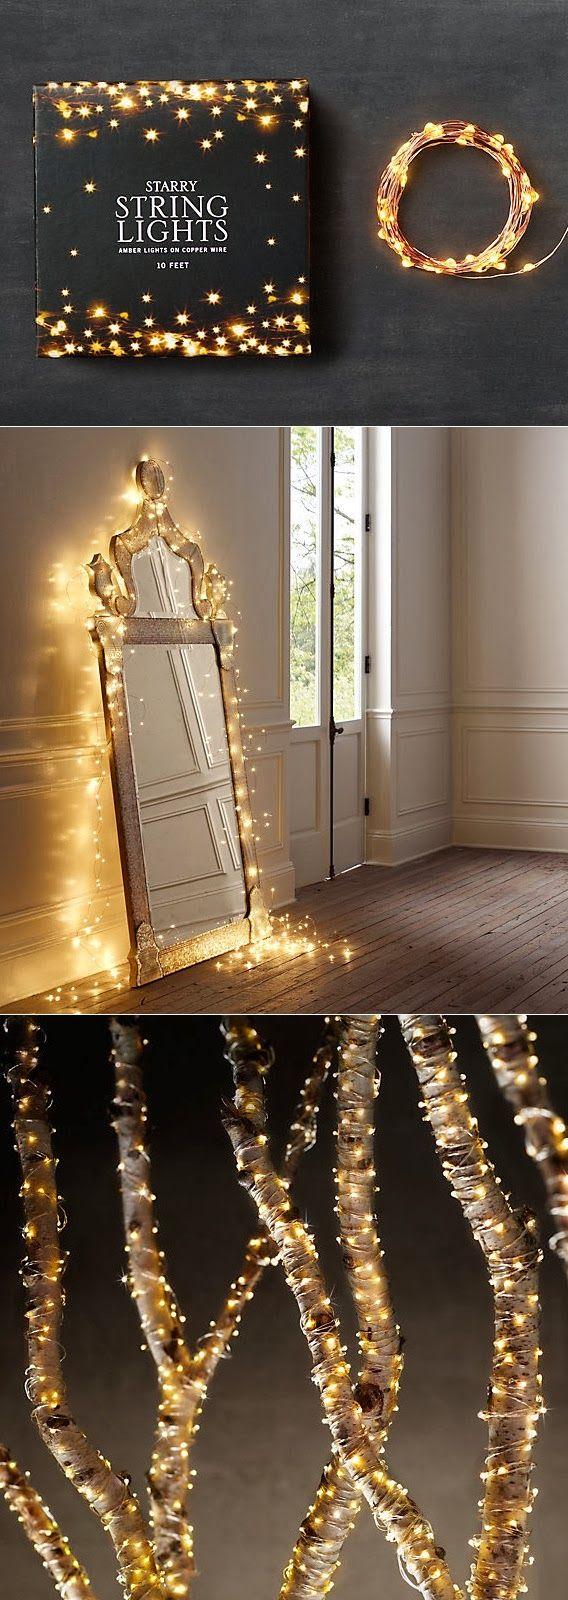 best Nuggets Room images on Pinterest Duvet covers Bedroom